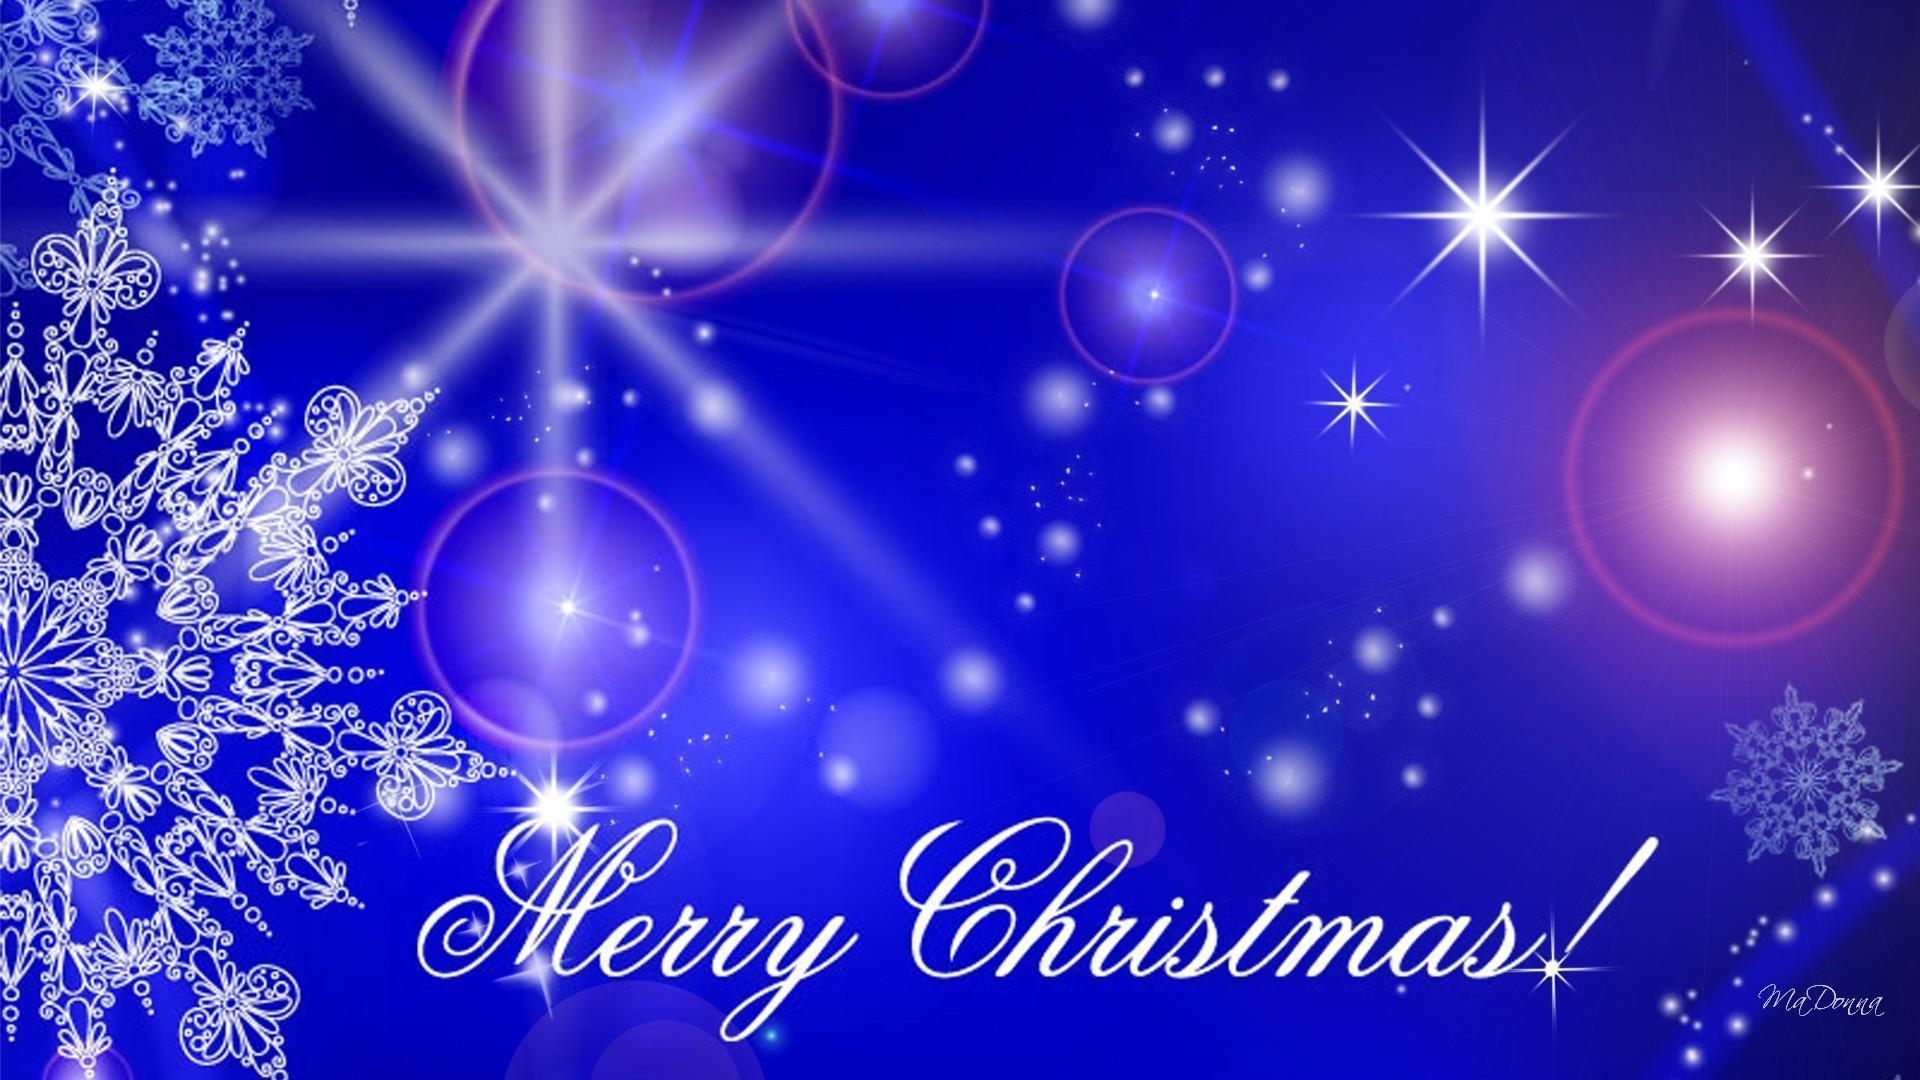 HD Blue Christmas Glowing Wallpaper